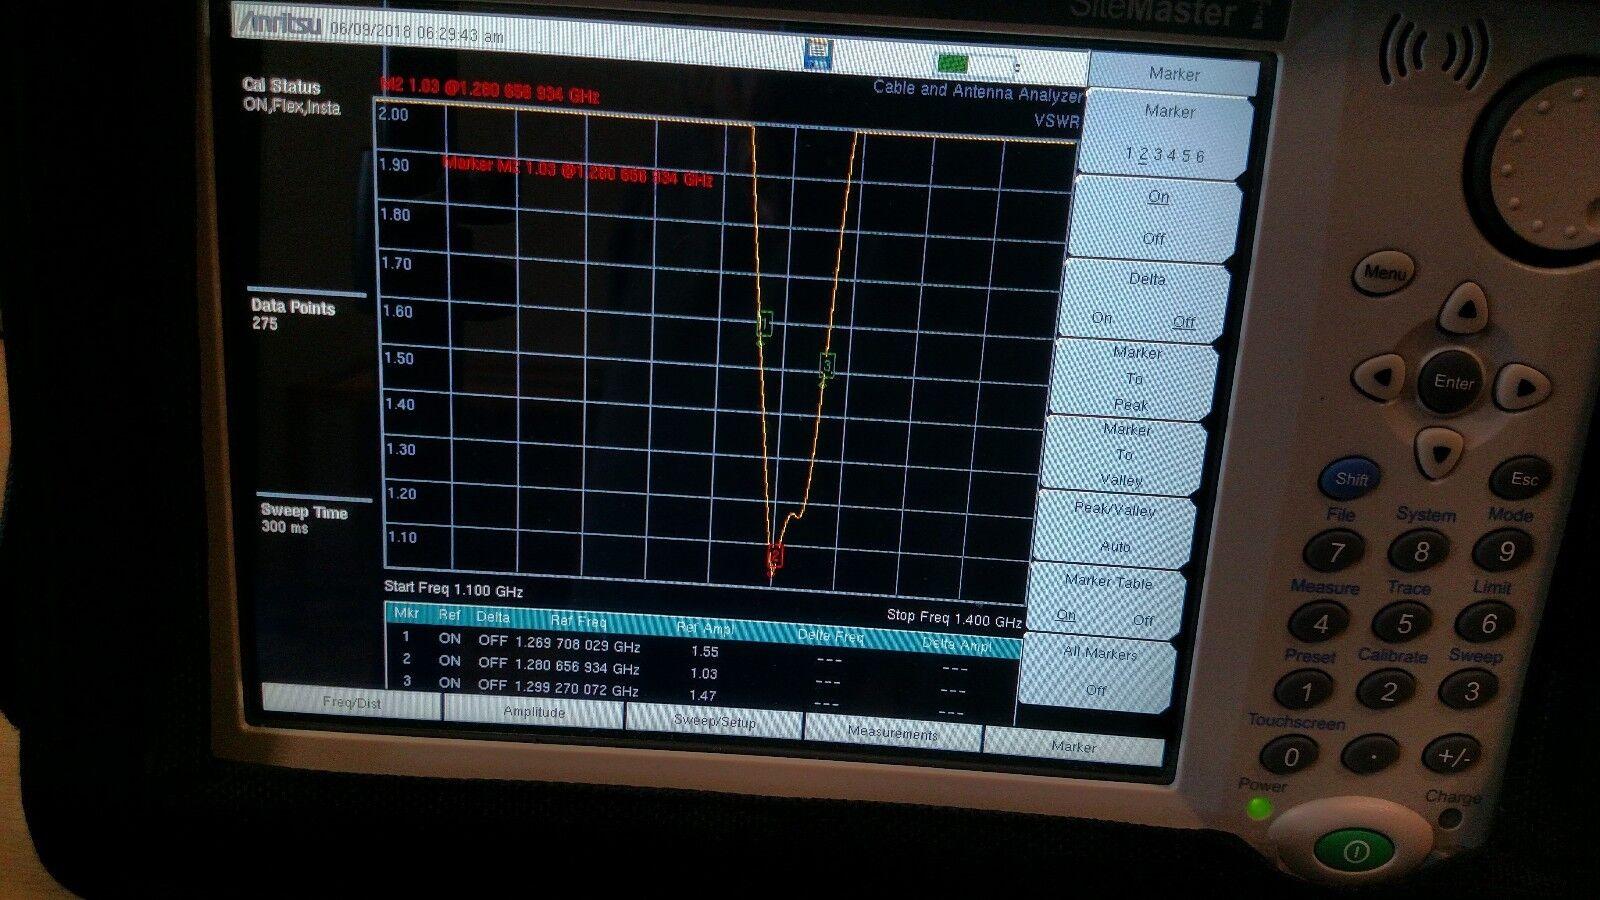 Antenna 1280MHz Uda - Yagi 17.1dBi 17.1dBi 17.1dBi 1.3GHz e521eb